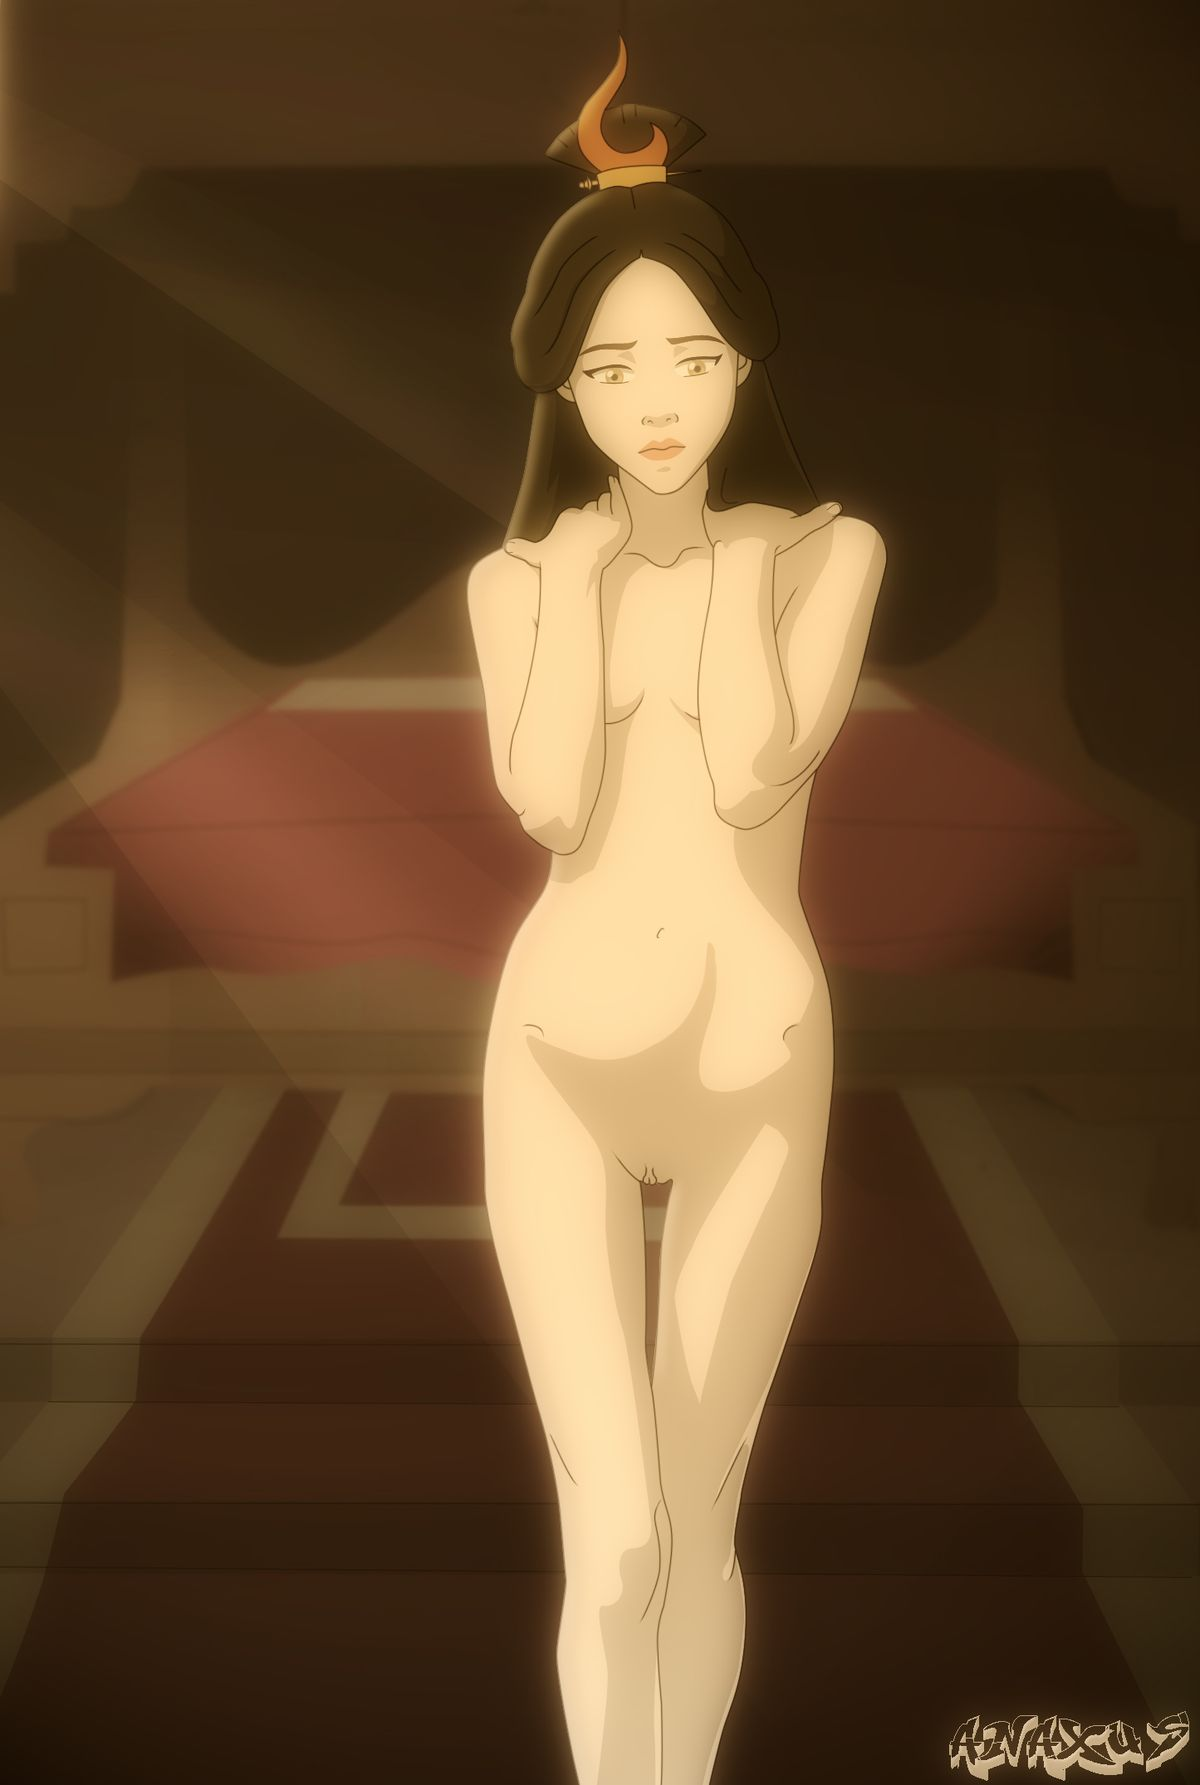 the airbender ursa last avatar Don't bully me nagatoro san